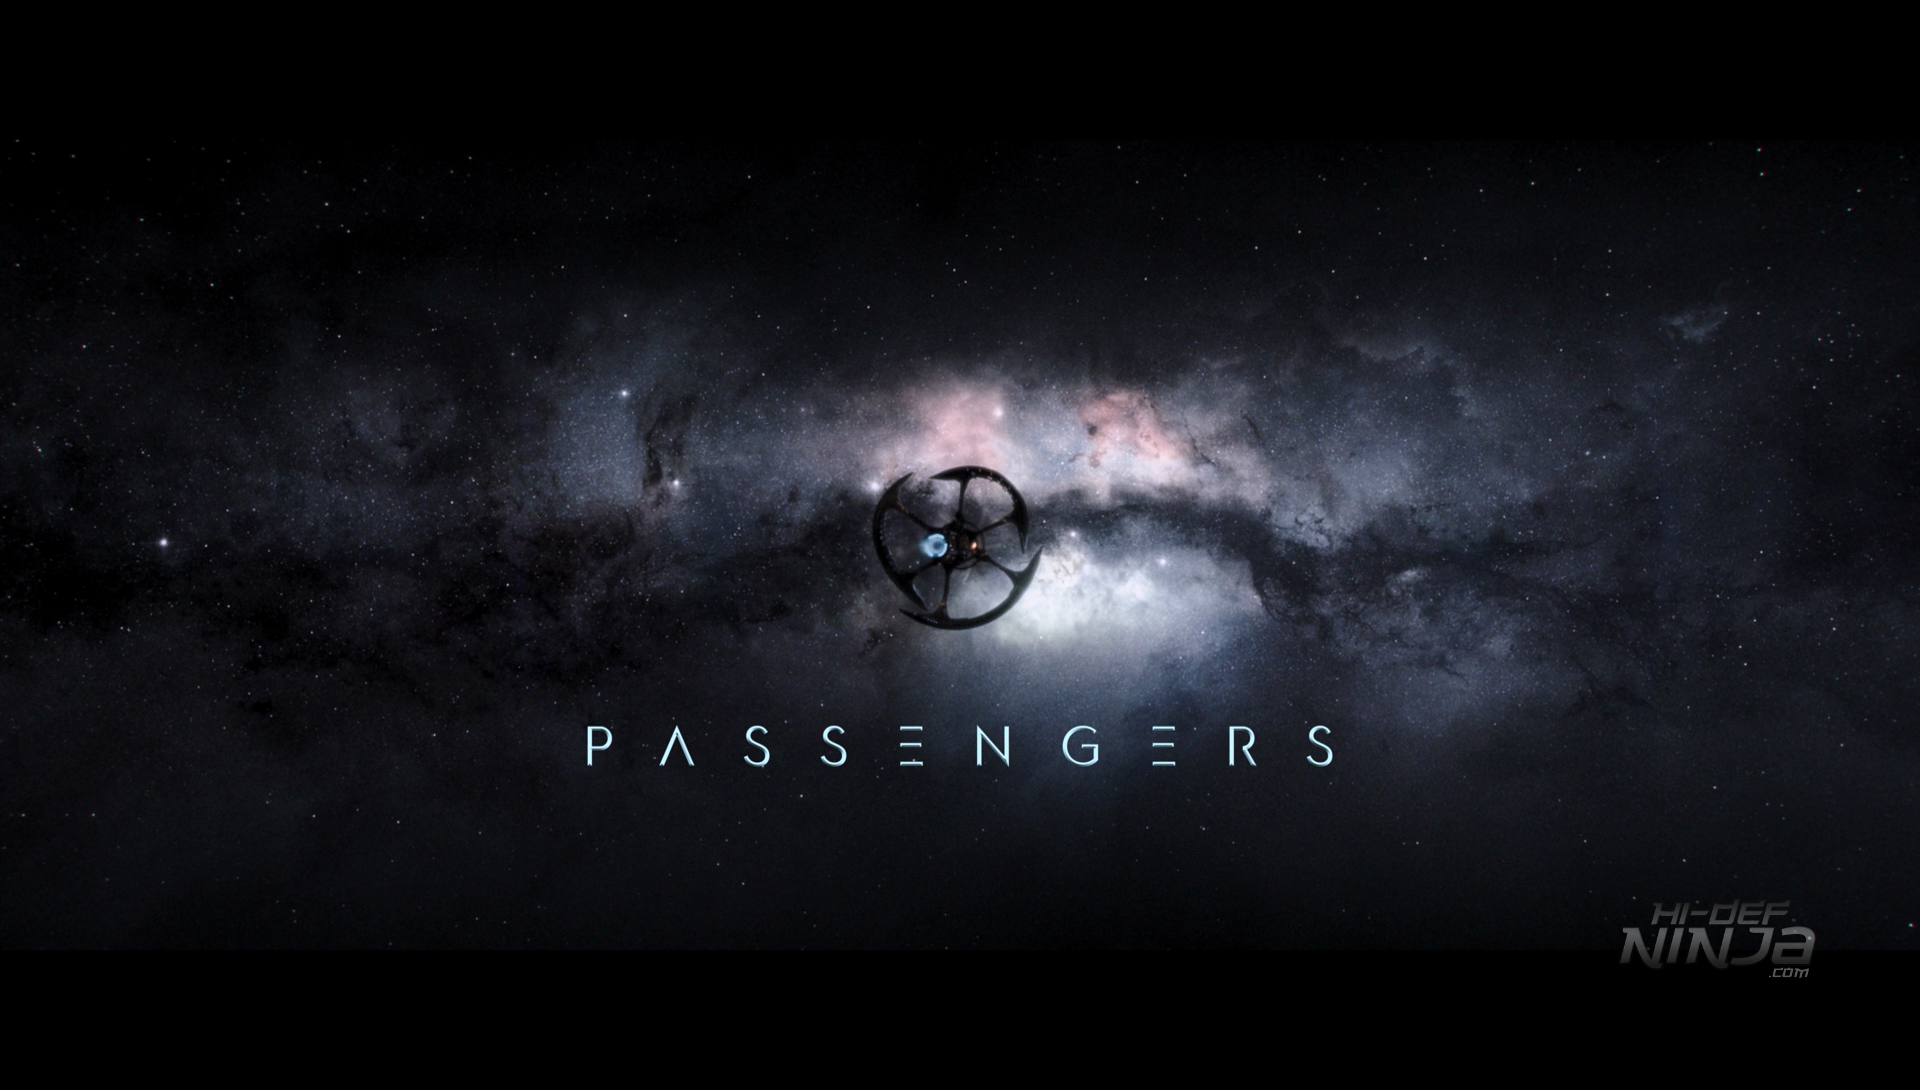 Passengers-HiDefNinja (1)